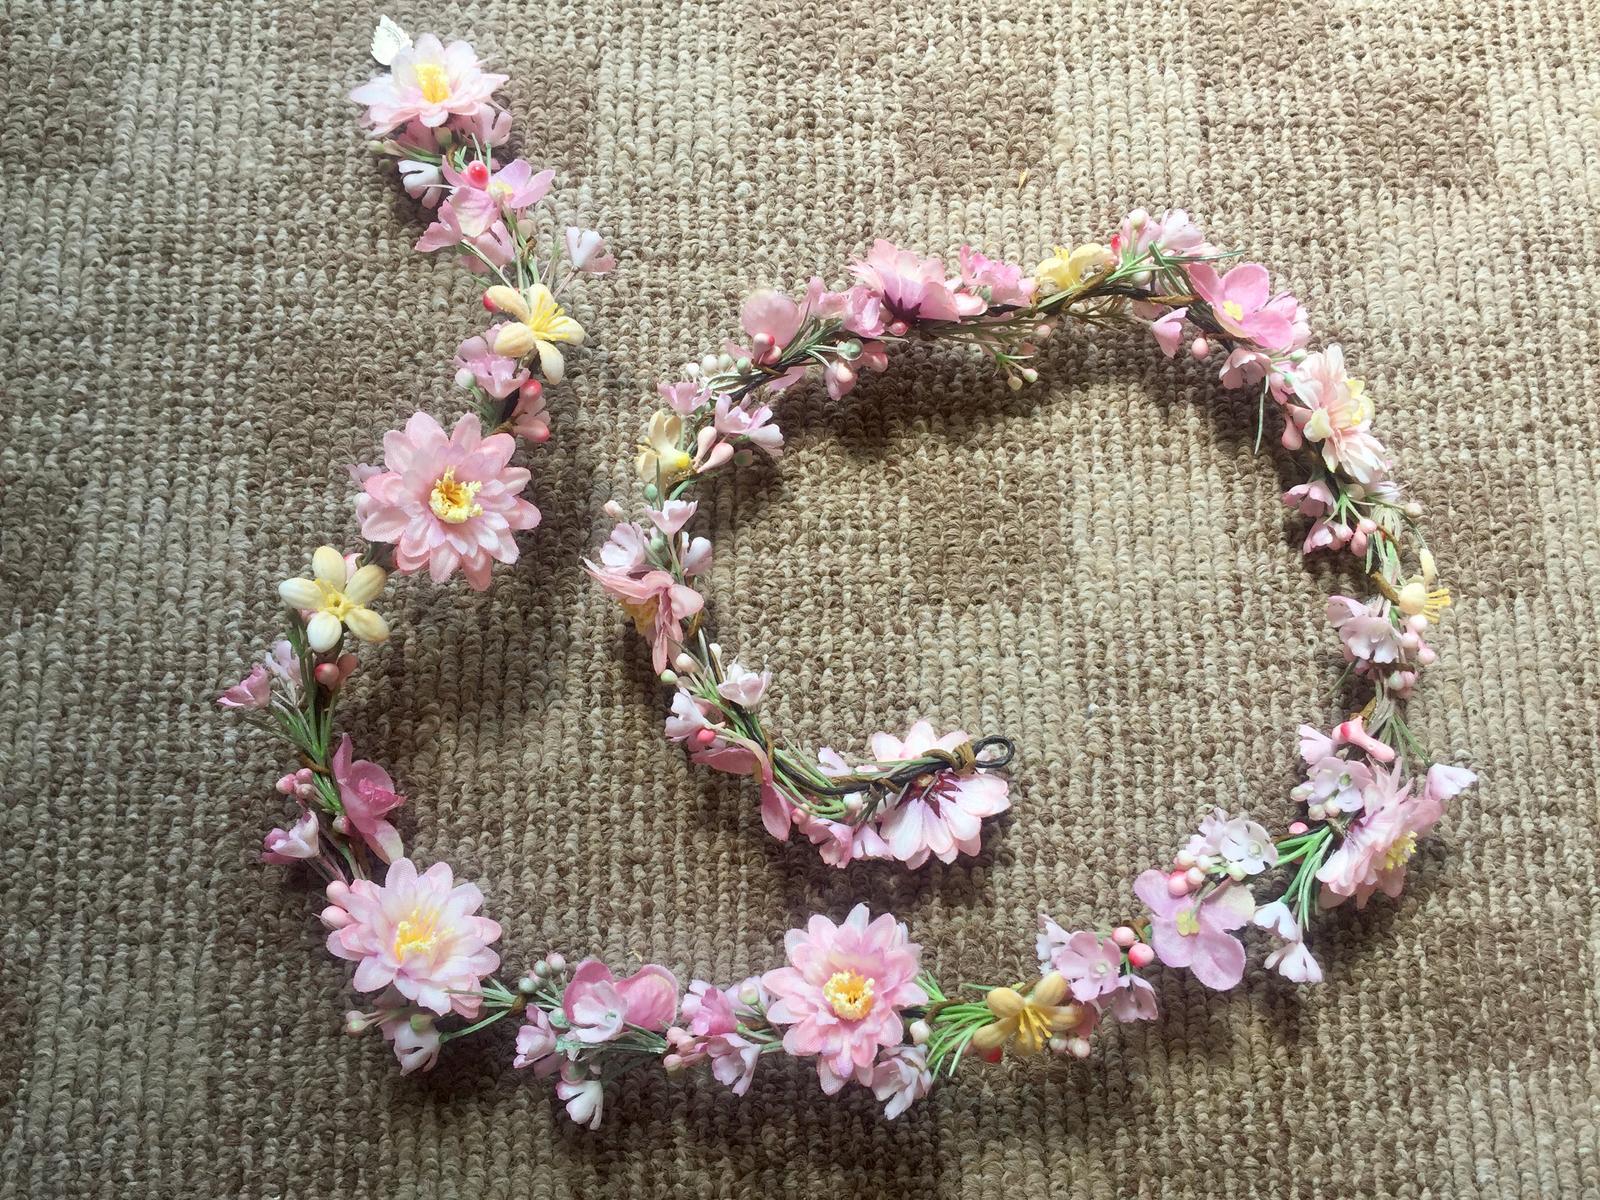 Kvetovy pletenec do vlasov - Obrázok č. 1